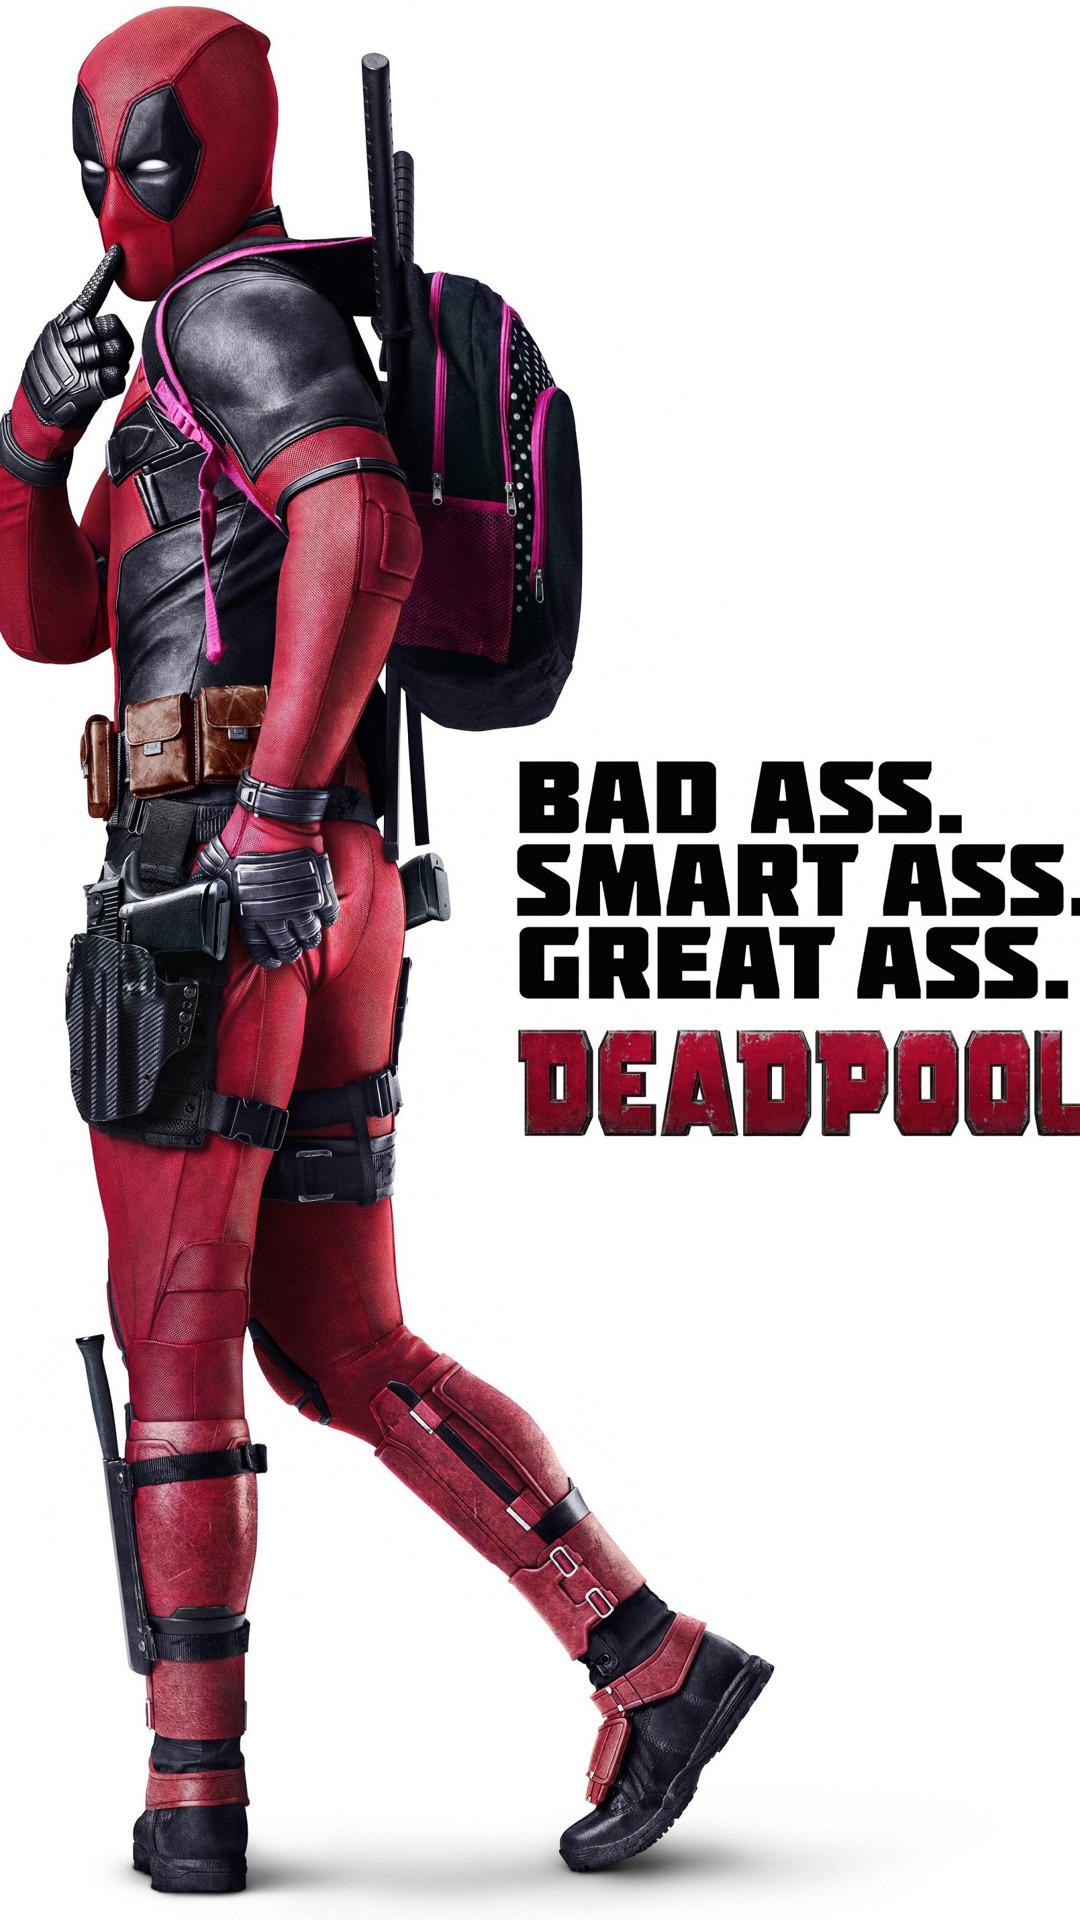 Deadpool The Movie iPhone 6 Plus Wallpaper (1080×1920)